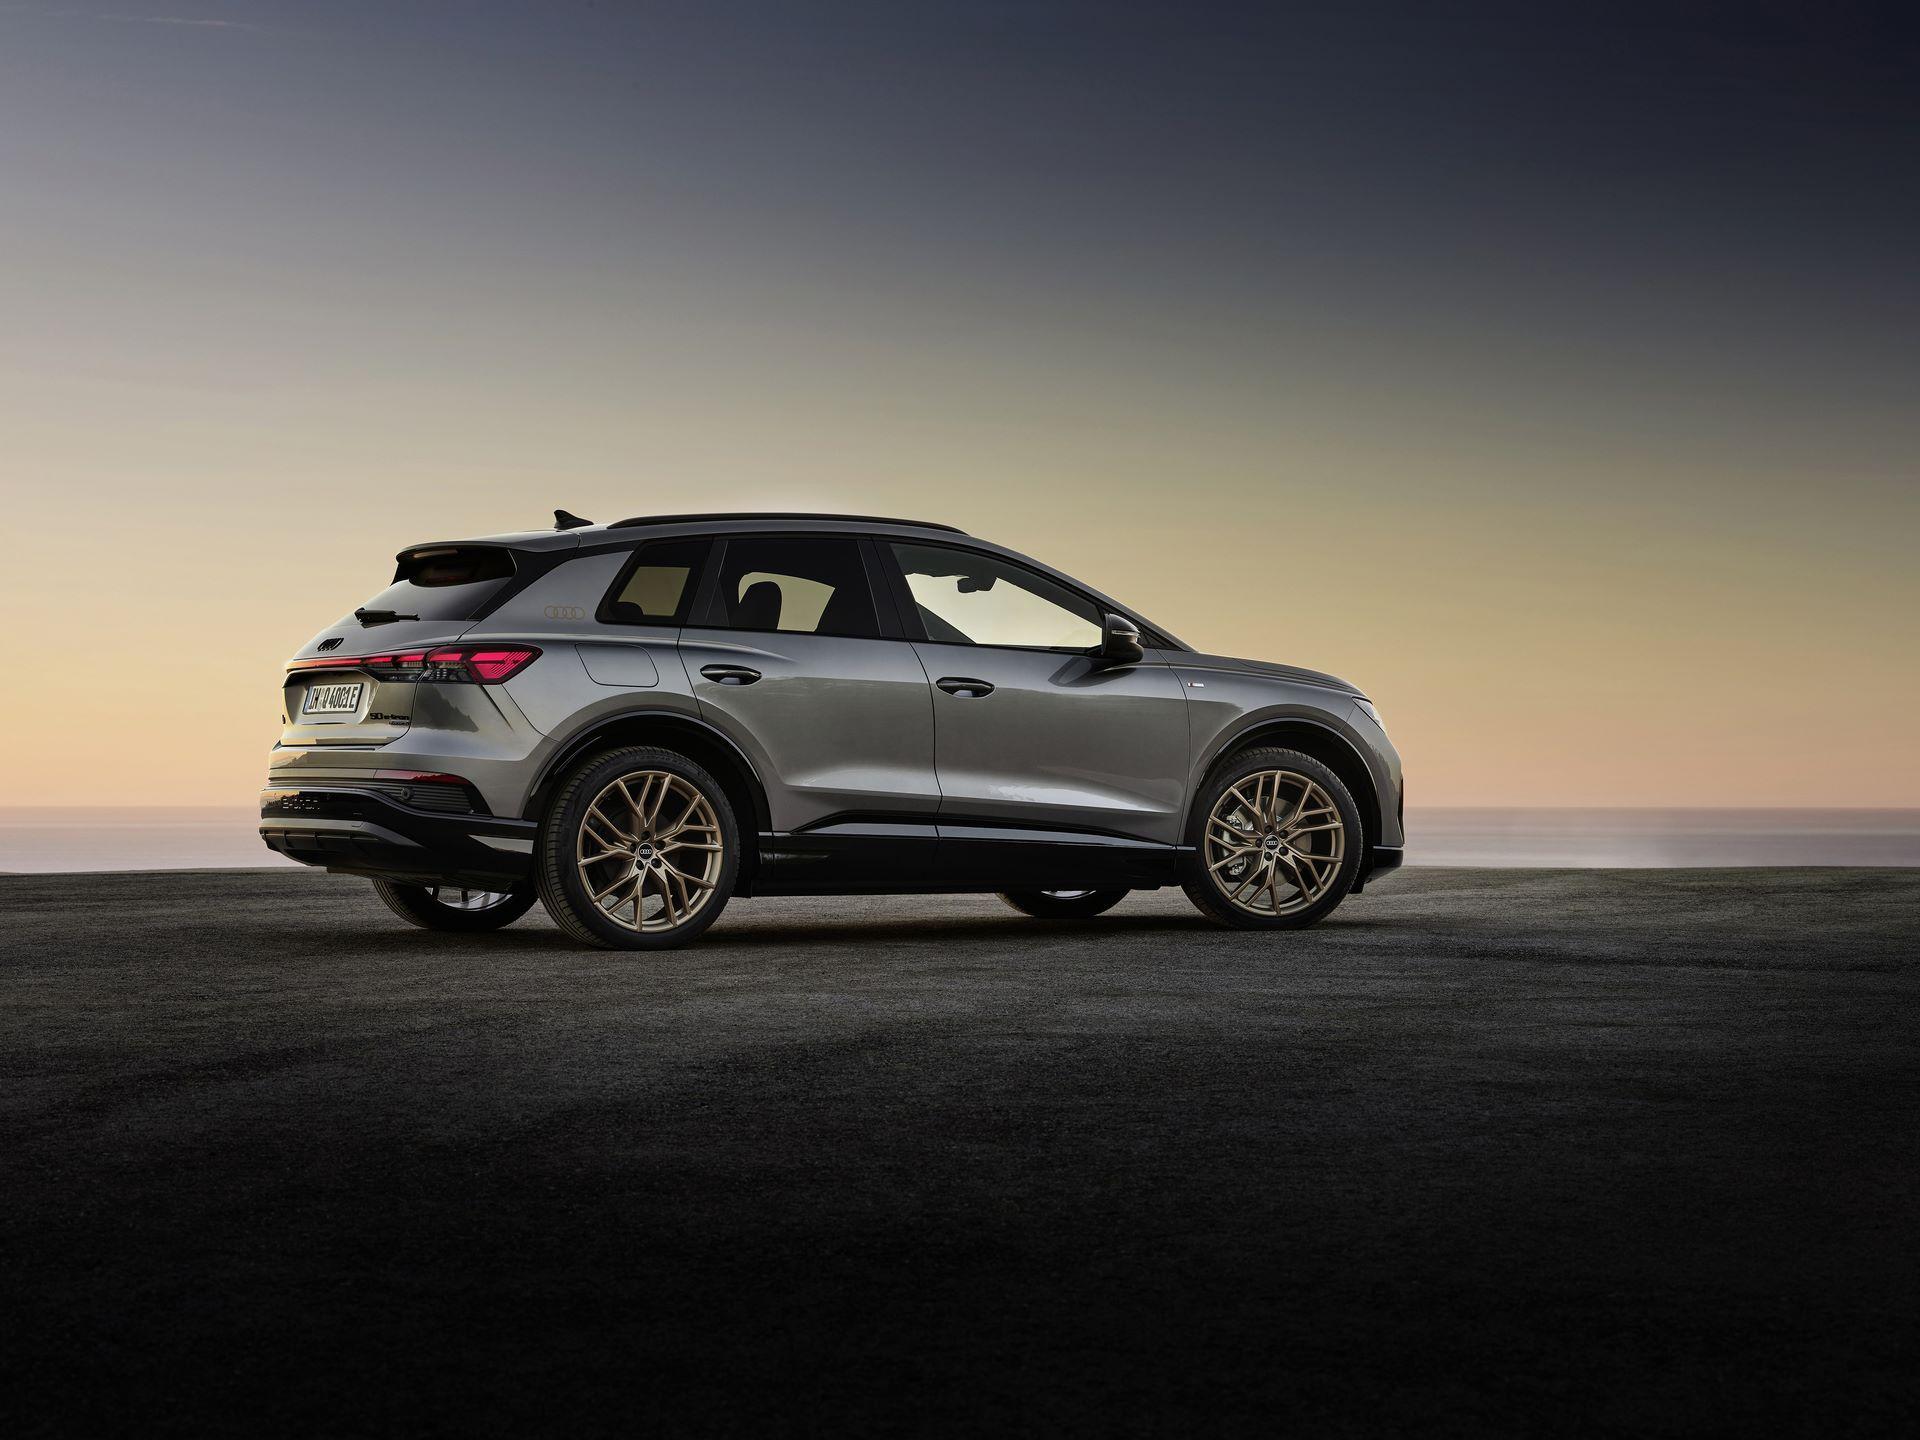 Audi-Q4-e-tron-and-Q4-e-tron-Sportback-44